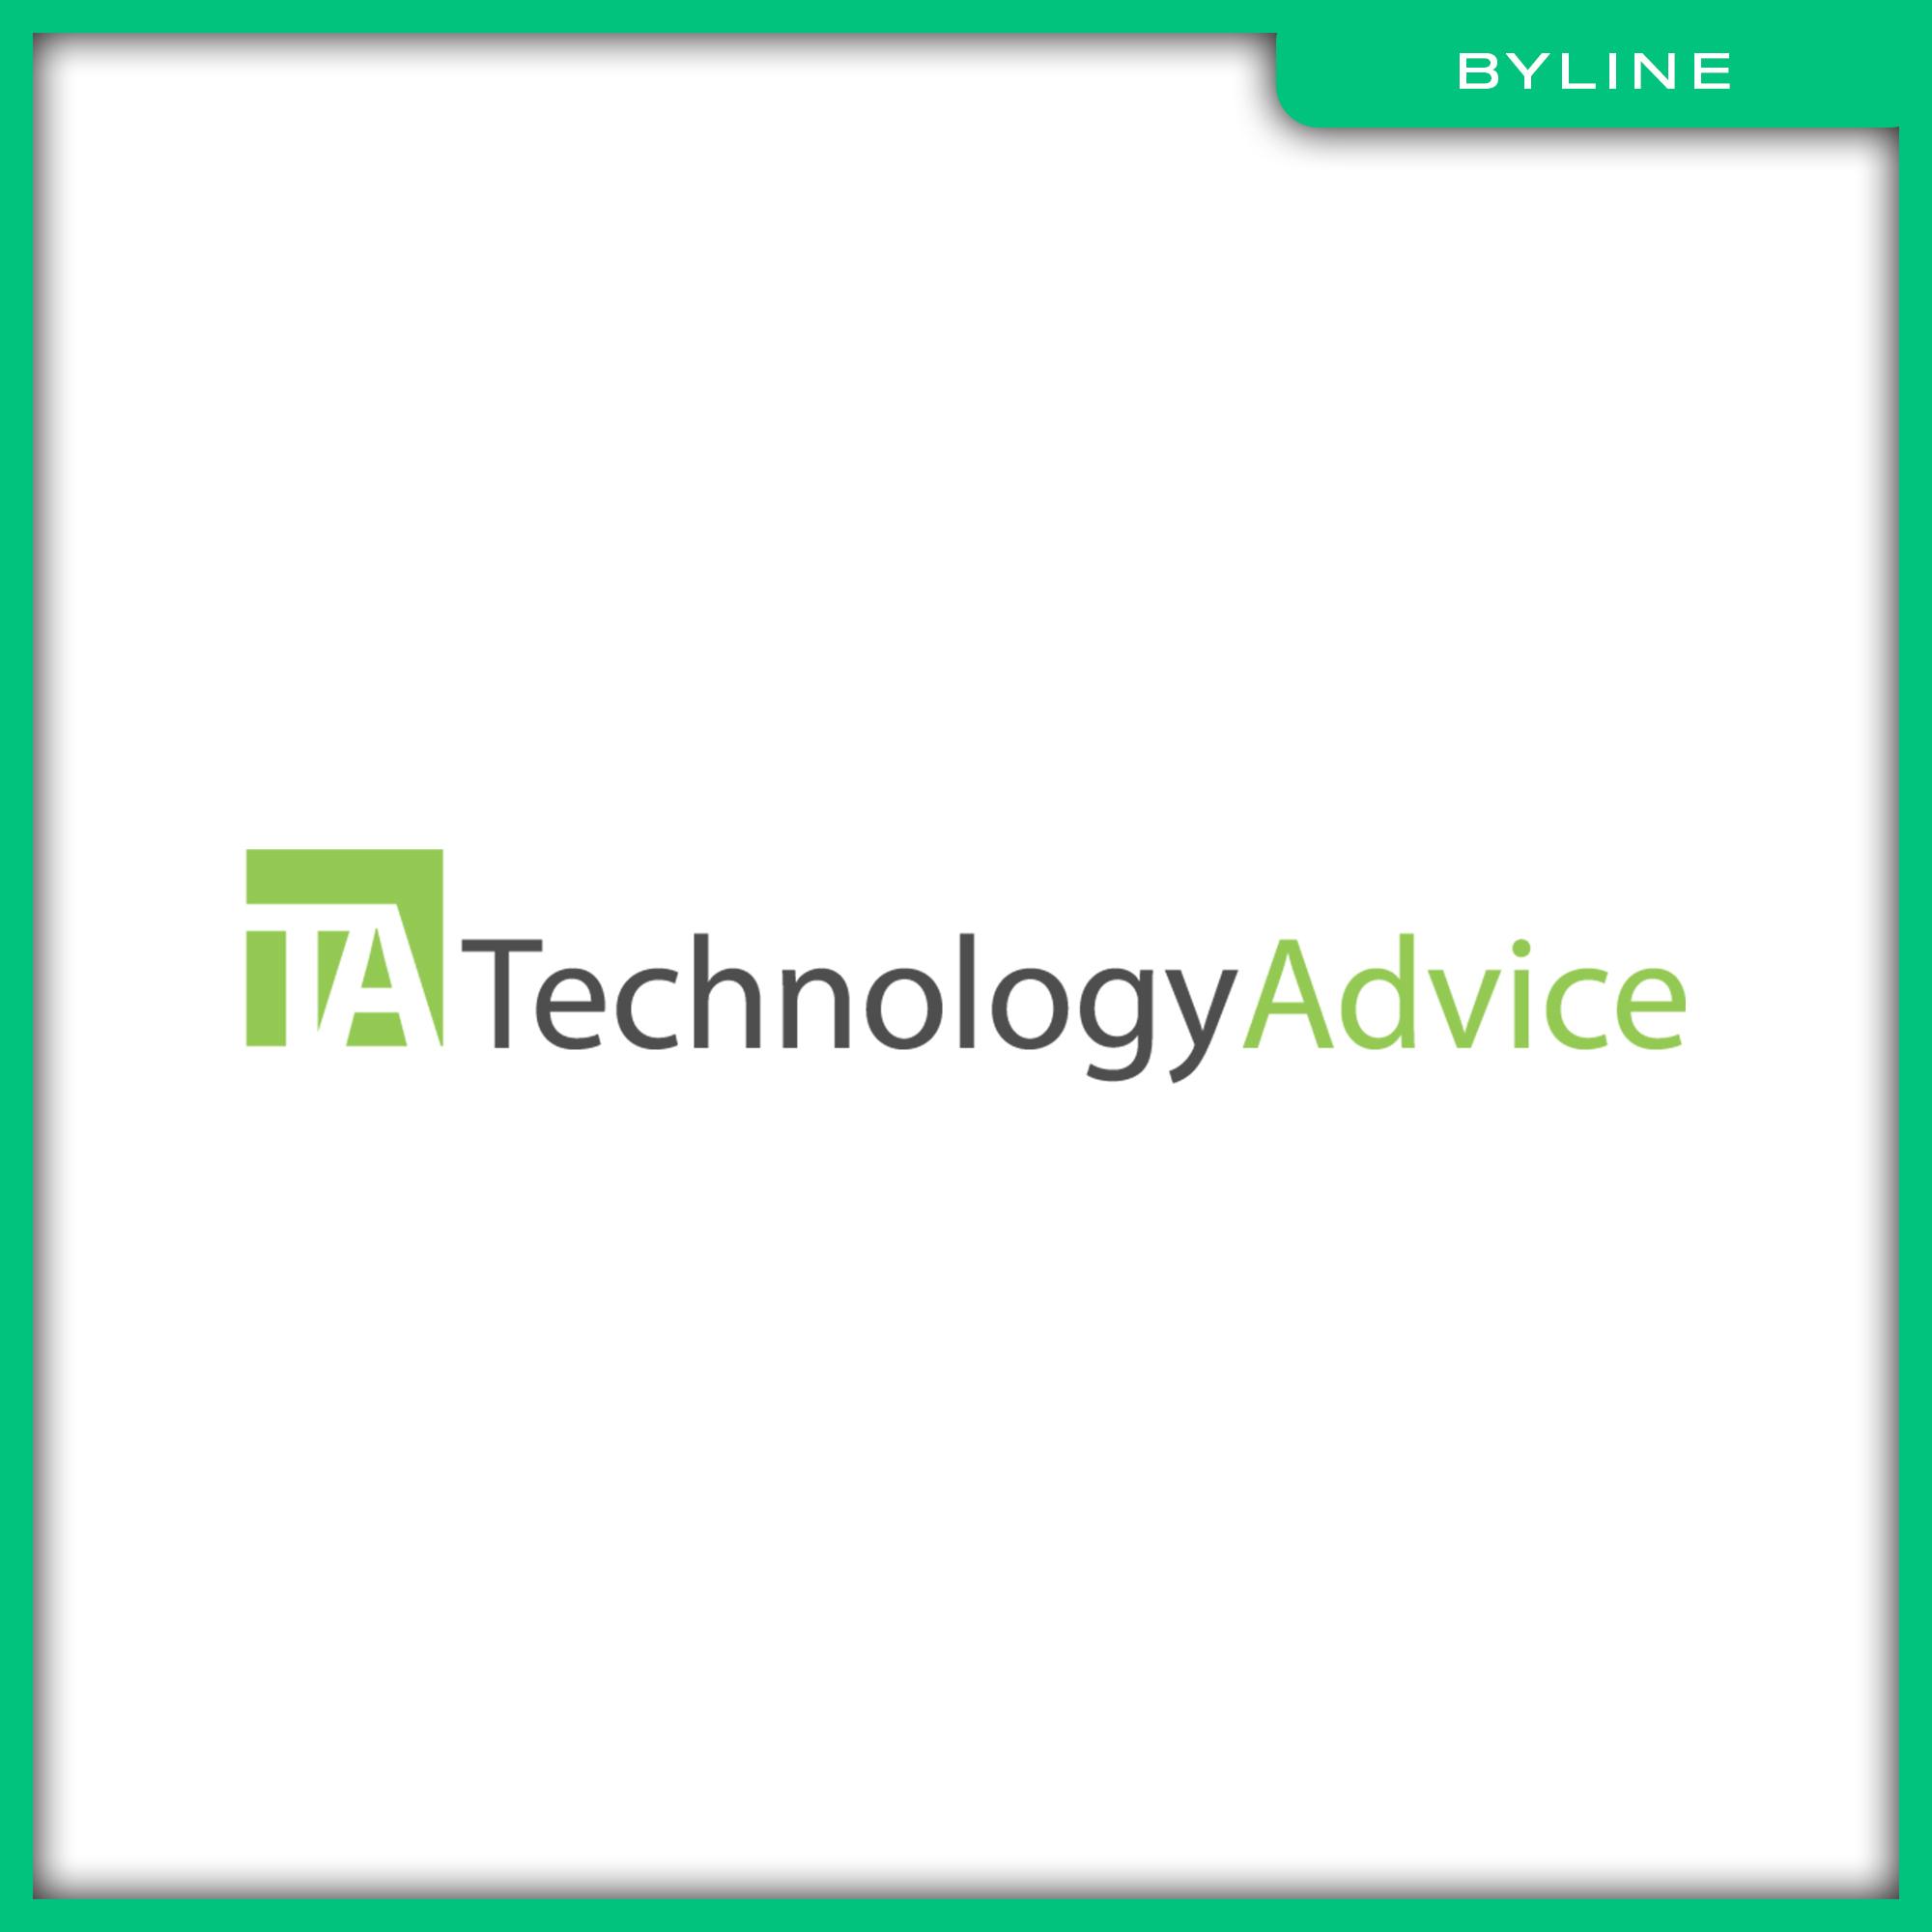 Technology-Advice